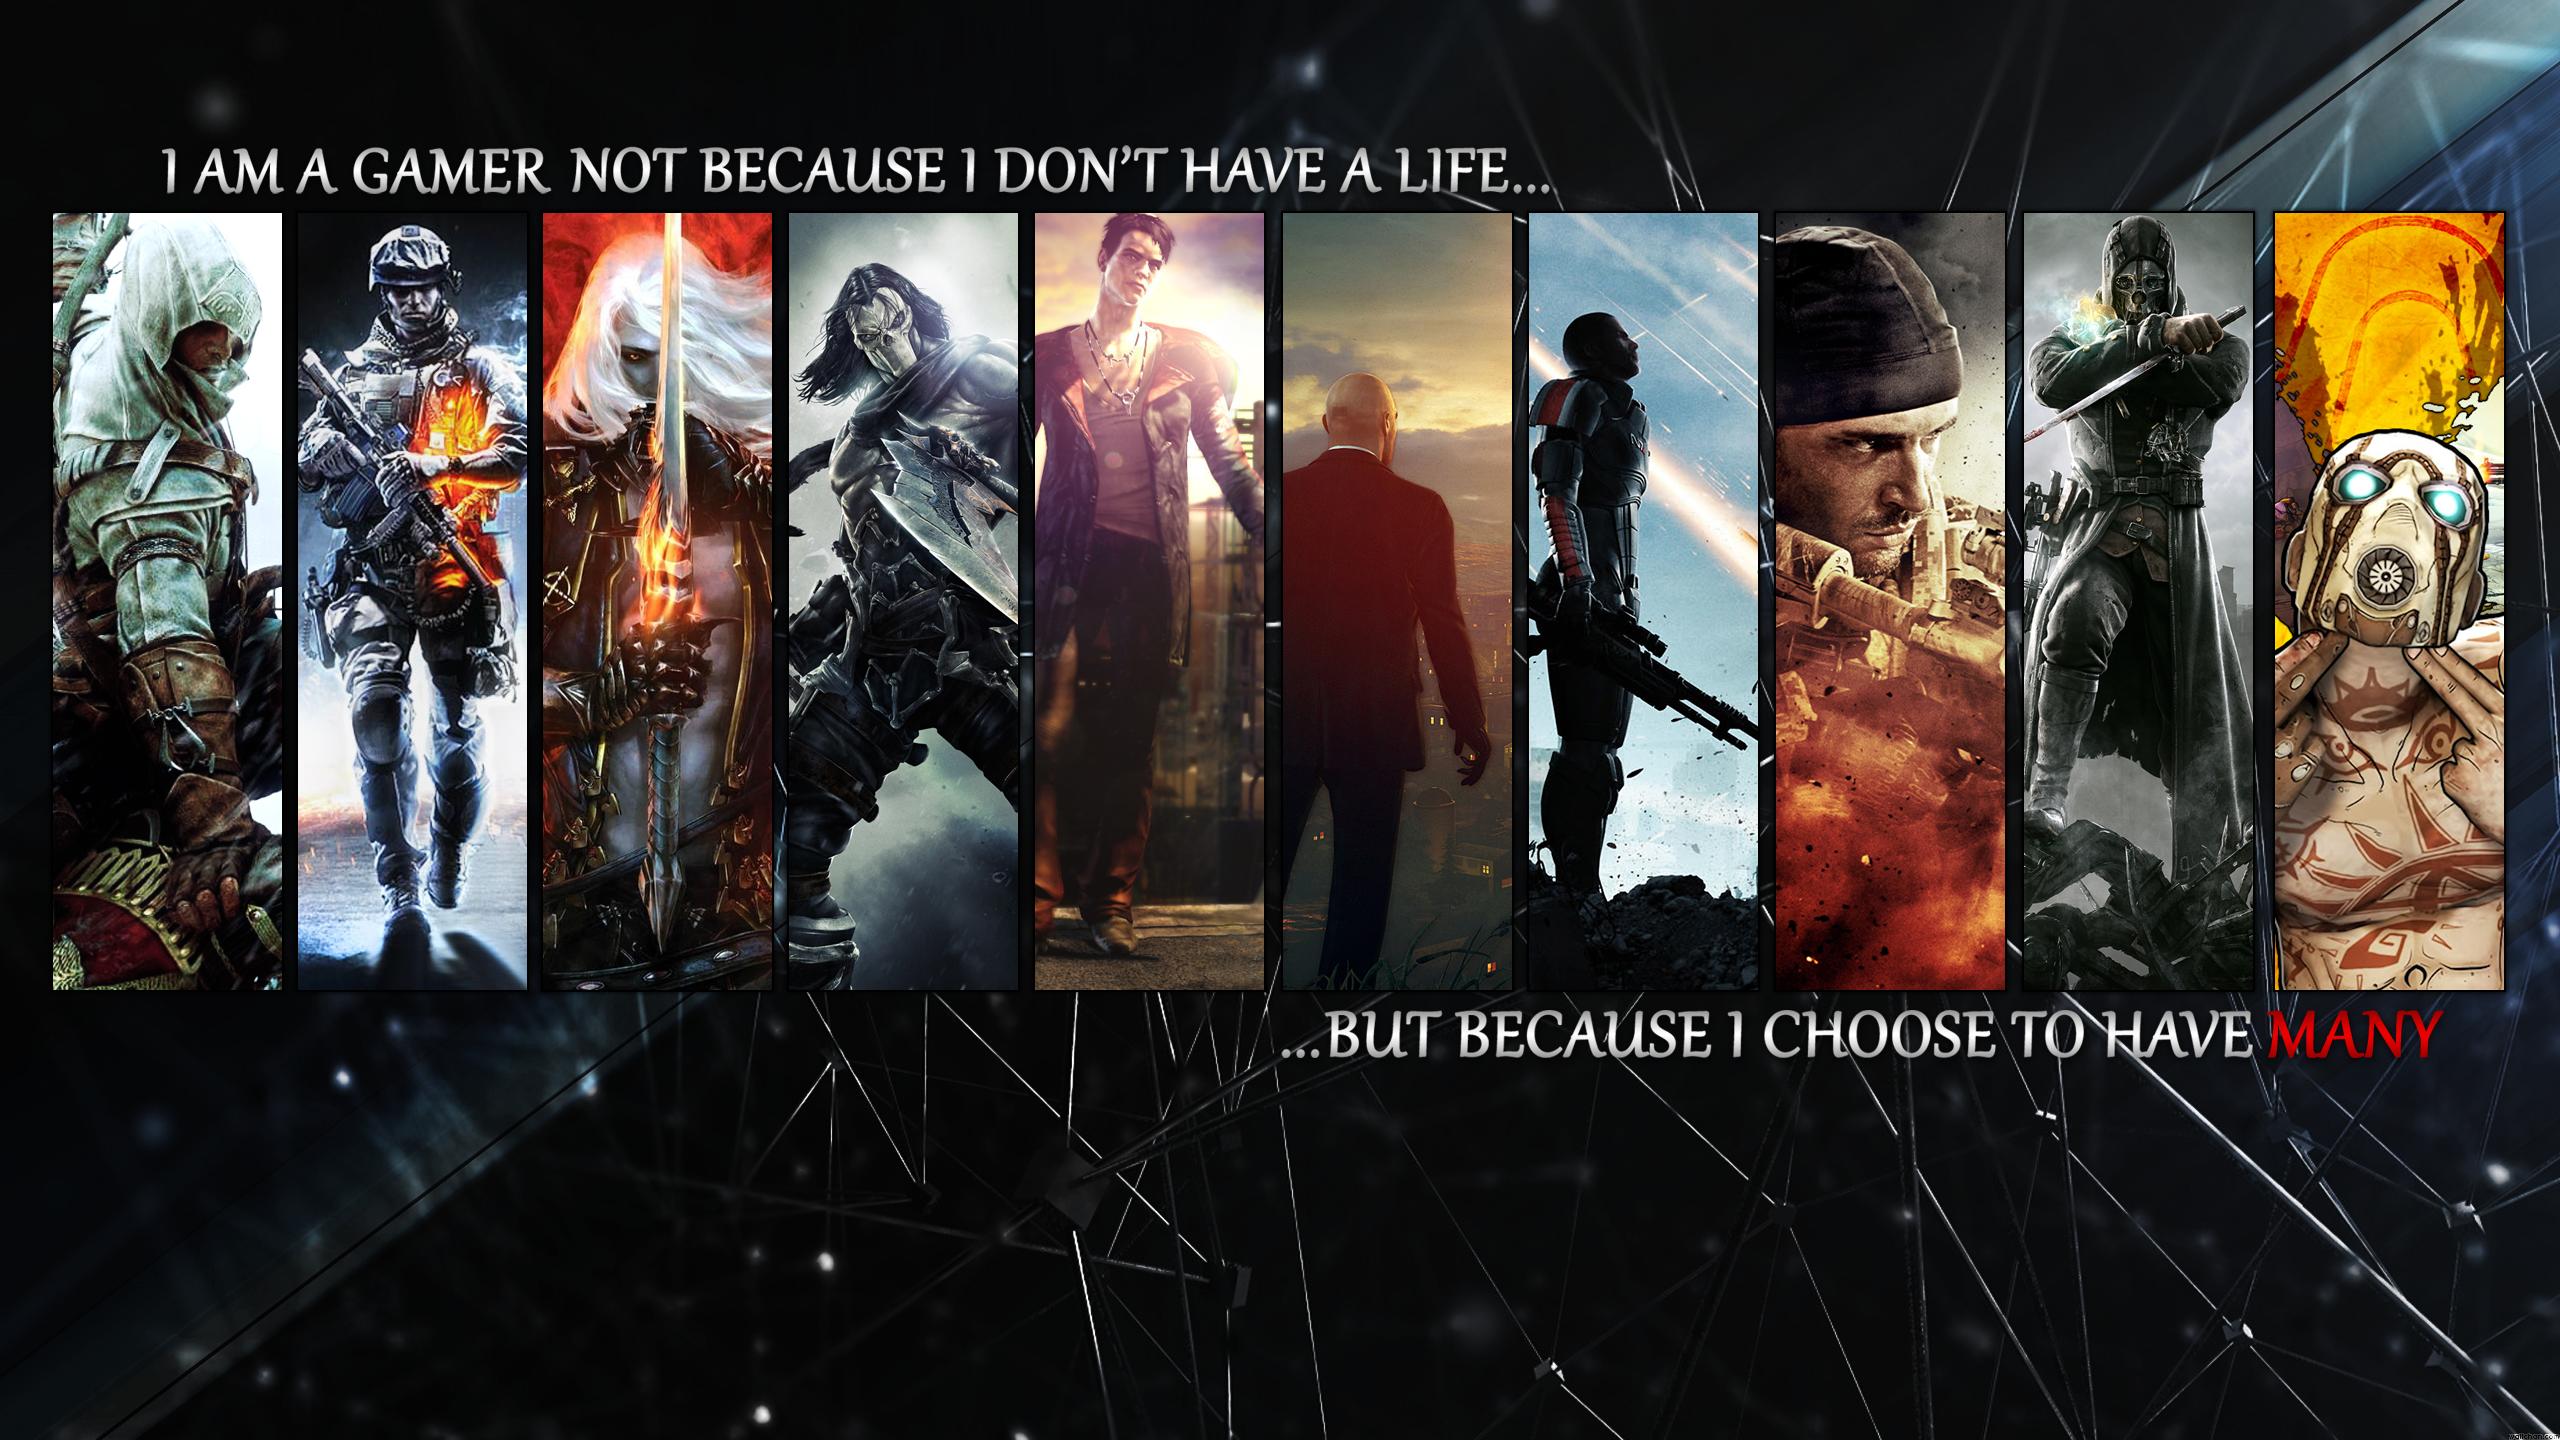 Gamers Gaming Wallpapers Gamer Mass Effect